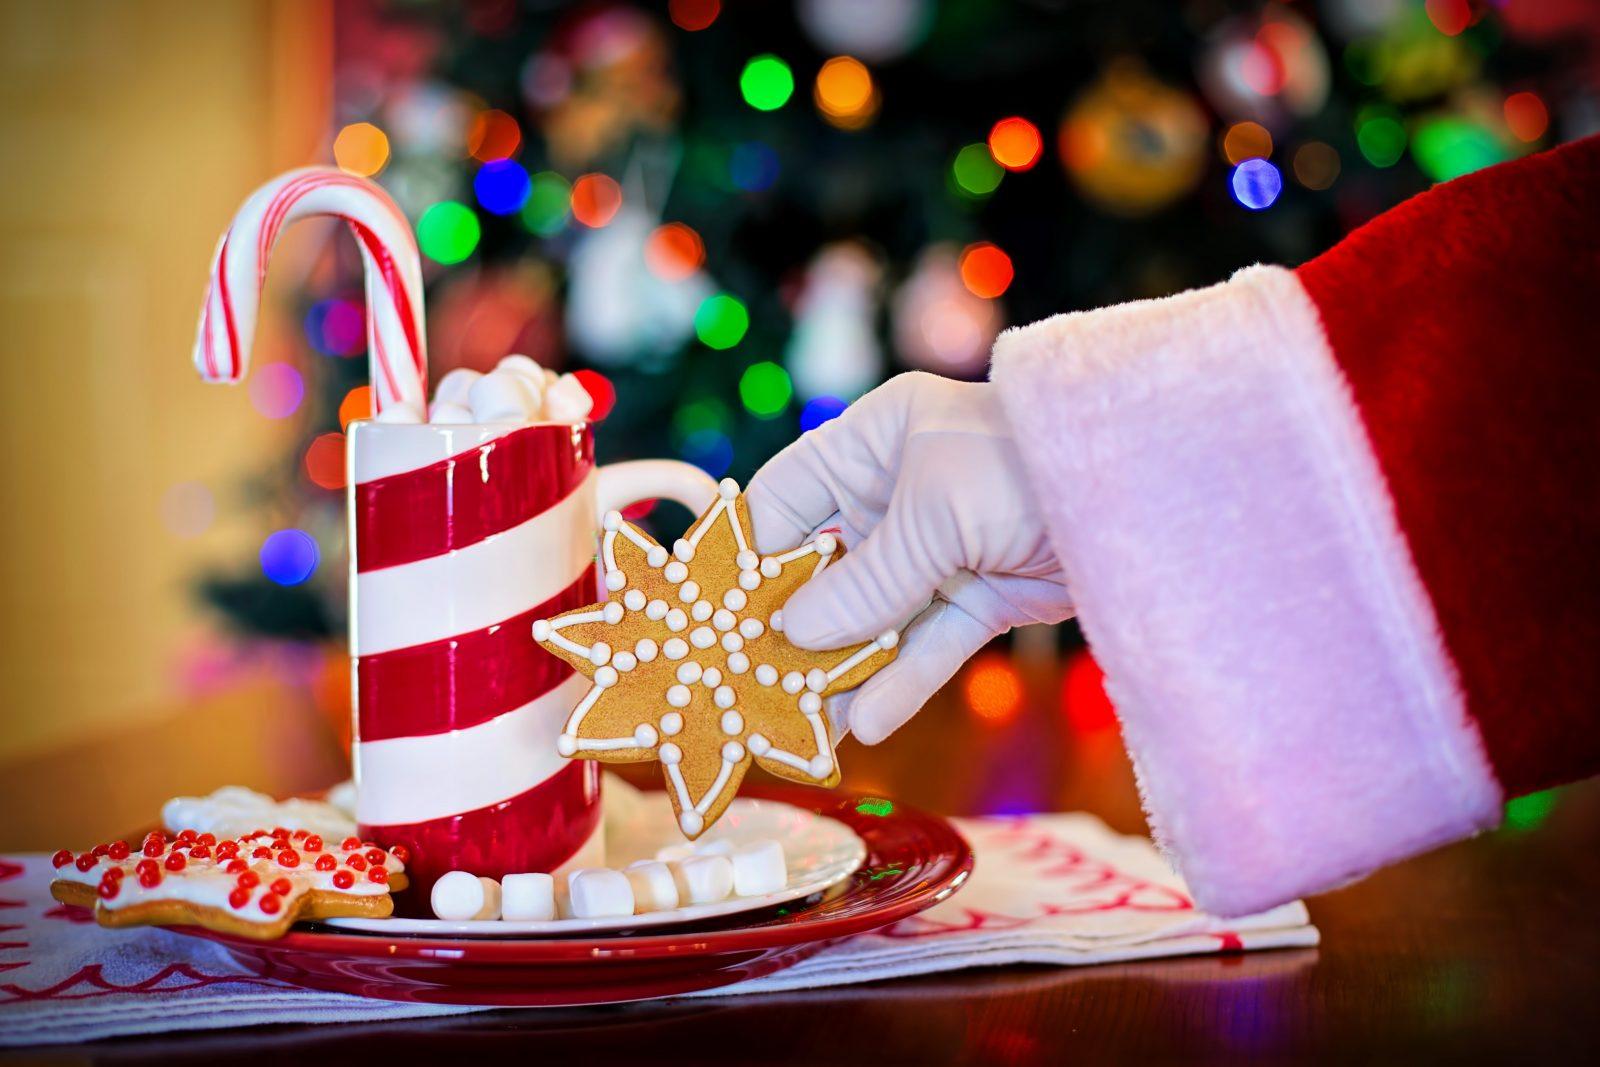 Santa's hand holding cookie